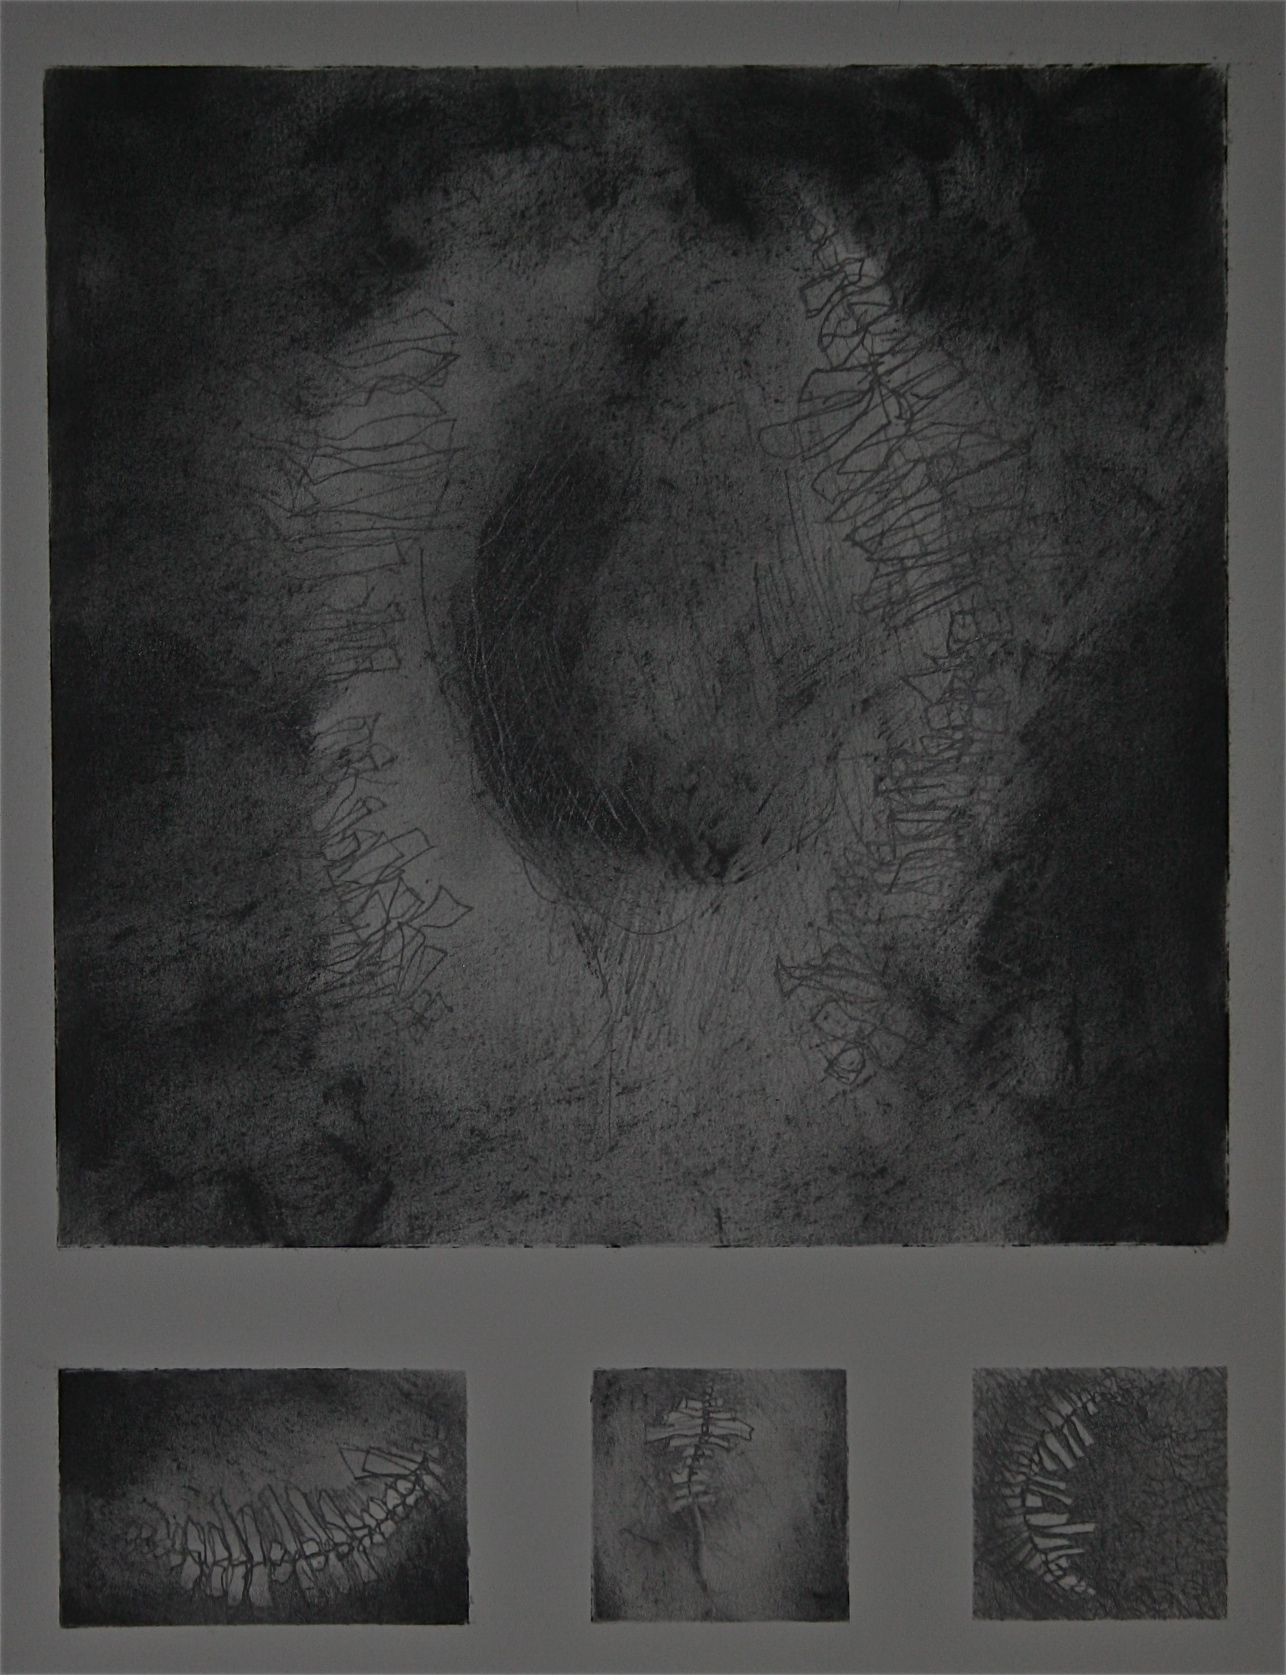 Jim Adams - Vague Memory - graphite on paper - 11 x 14: framed 375.00